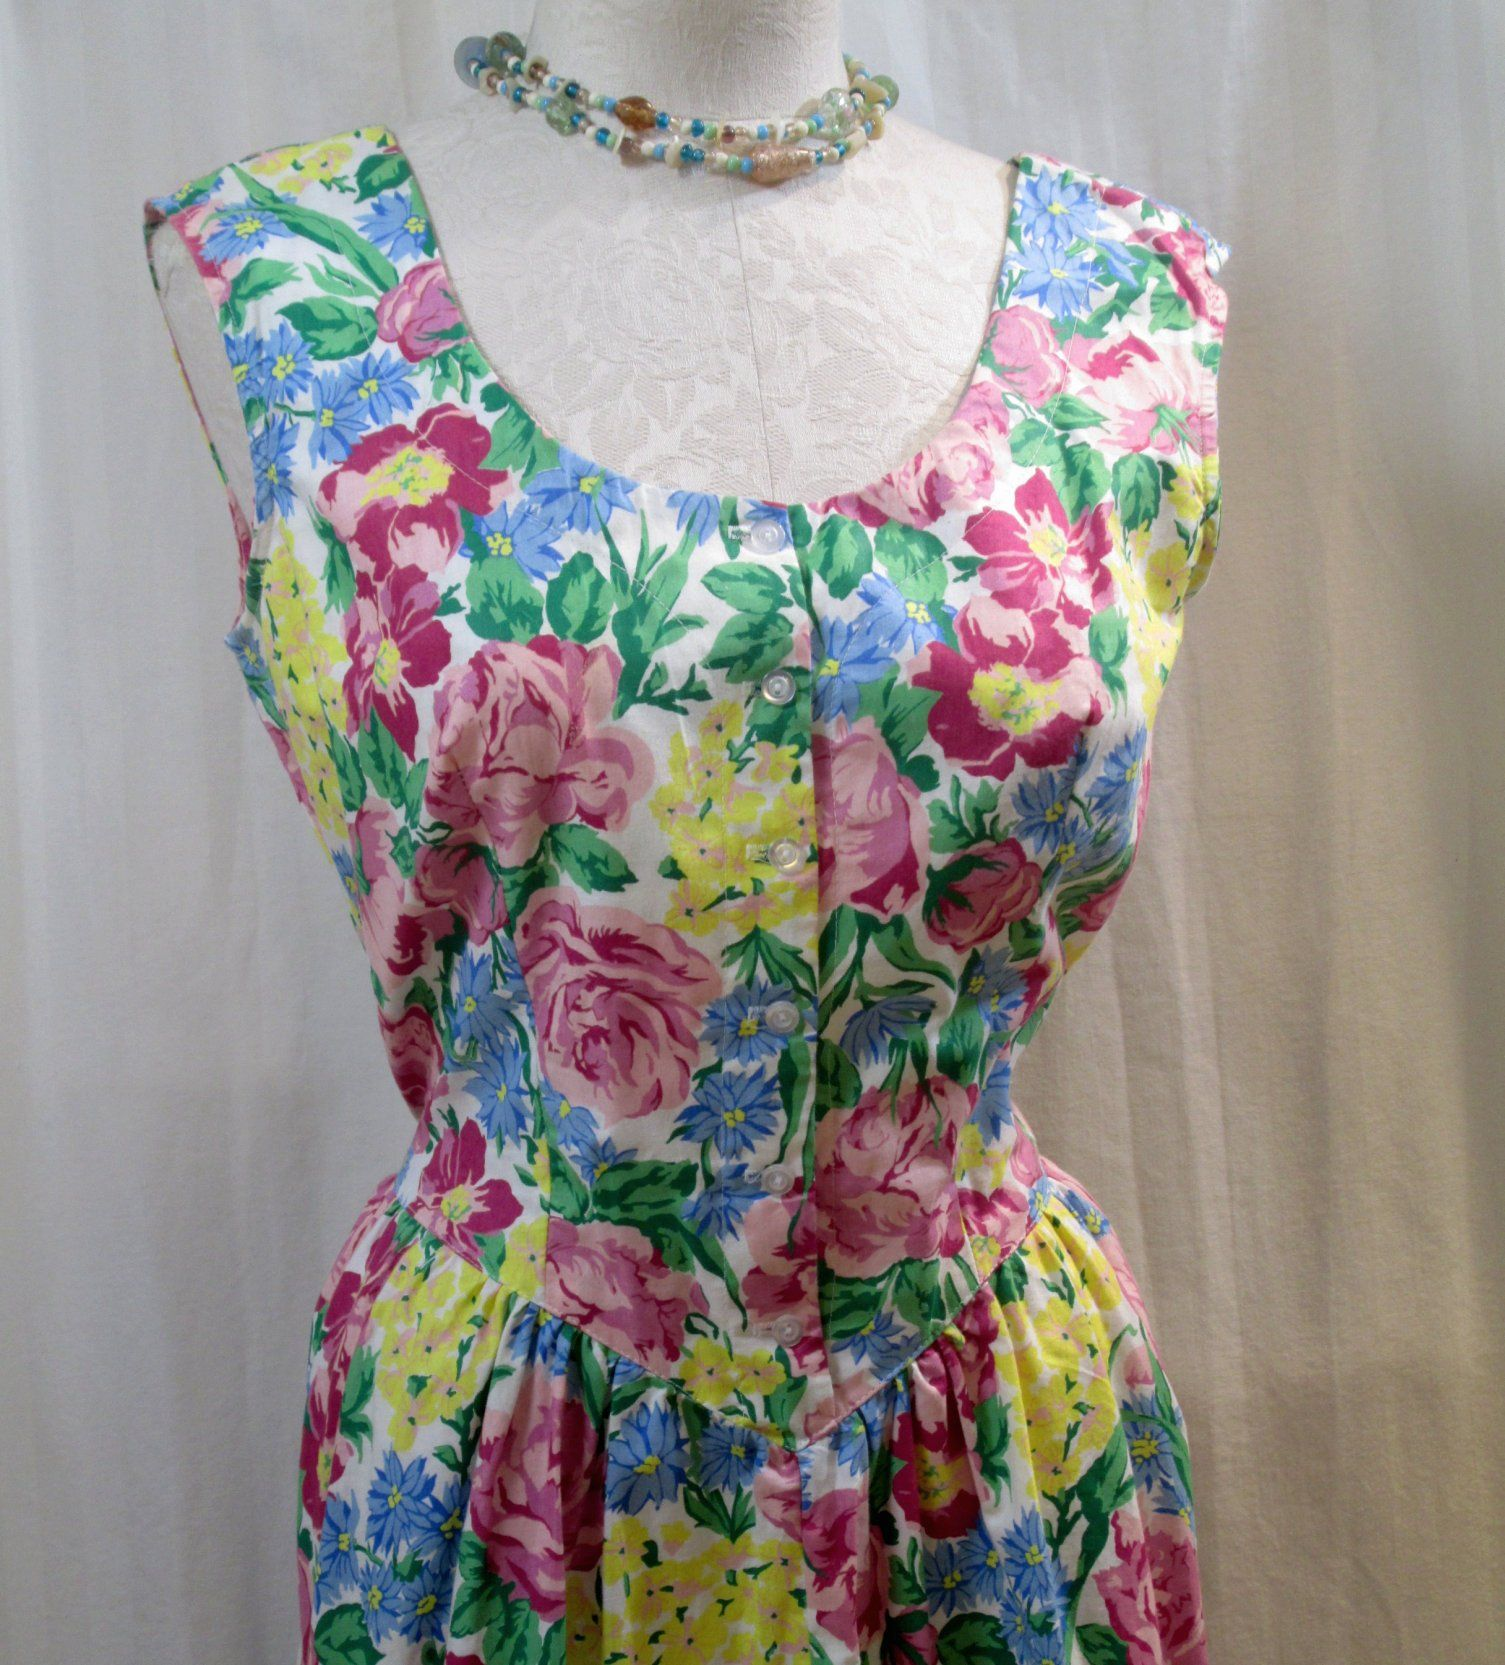 85cc613d9c 80s Vintage Bright Floral Dress pink roses floral 80s sundress vintage Rose  Flowers basque waist 80s